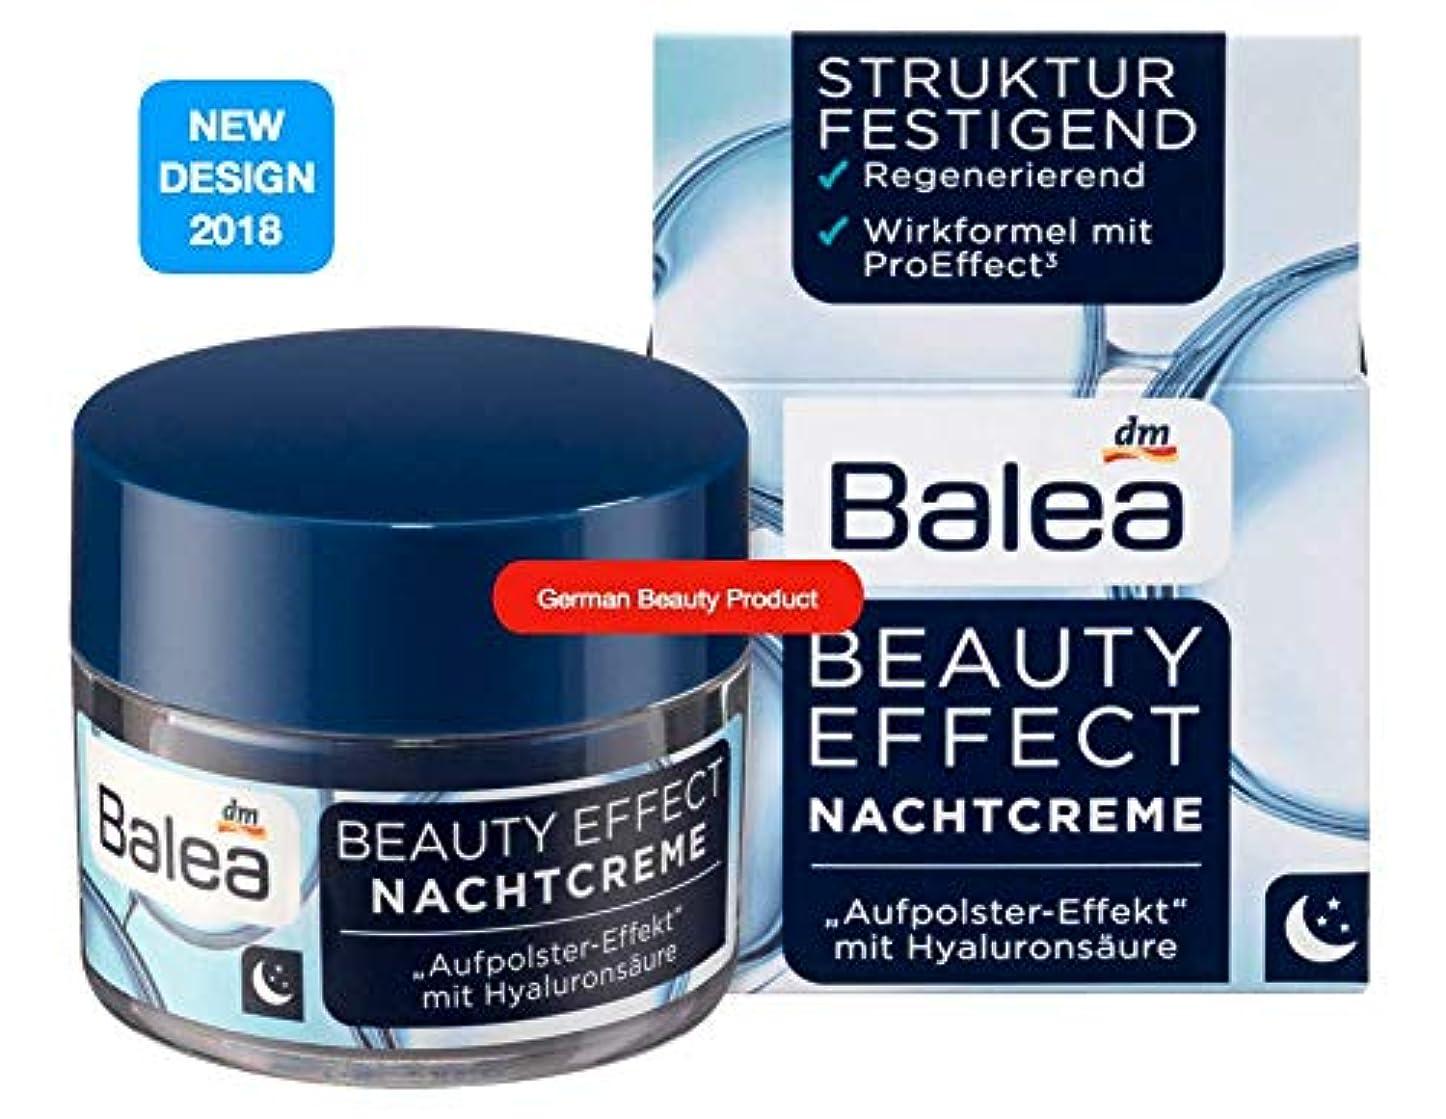 Balea Night Cream ナイトクリーム Beauty Effect, 50 ml